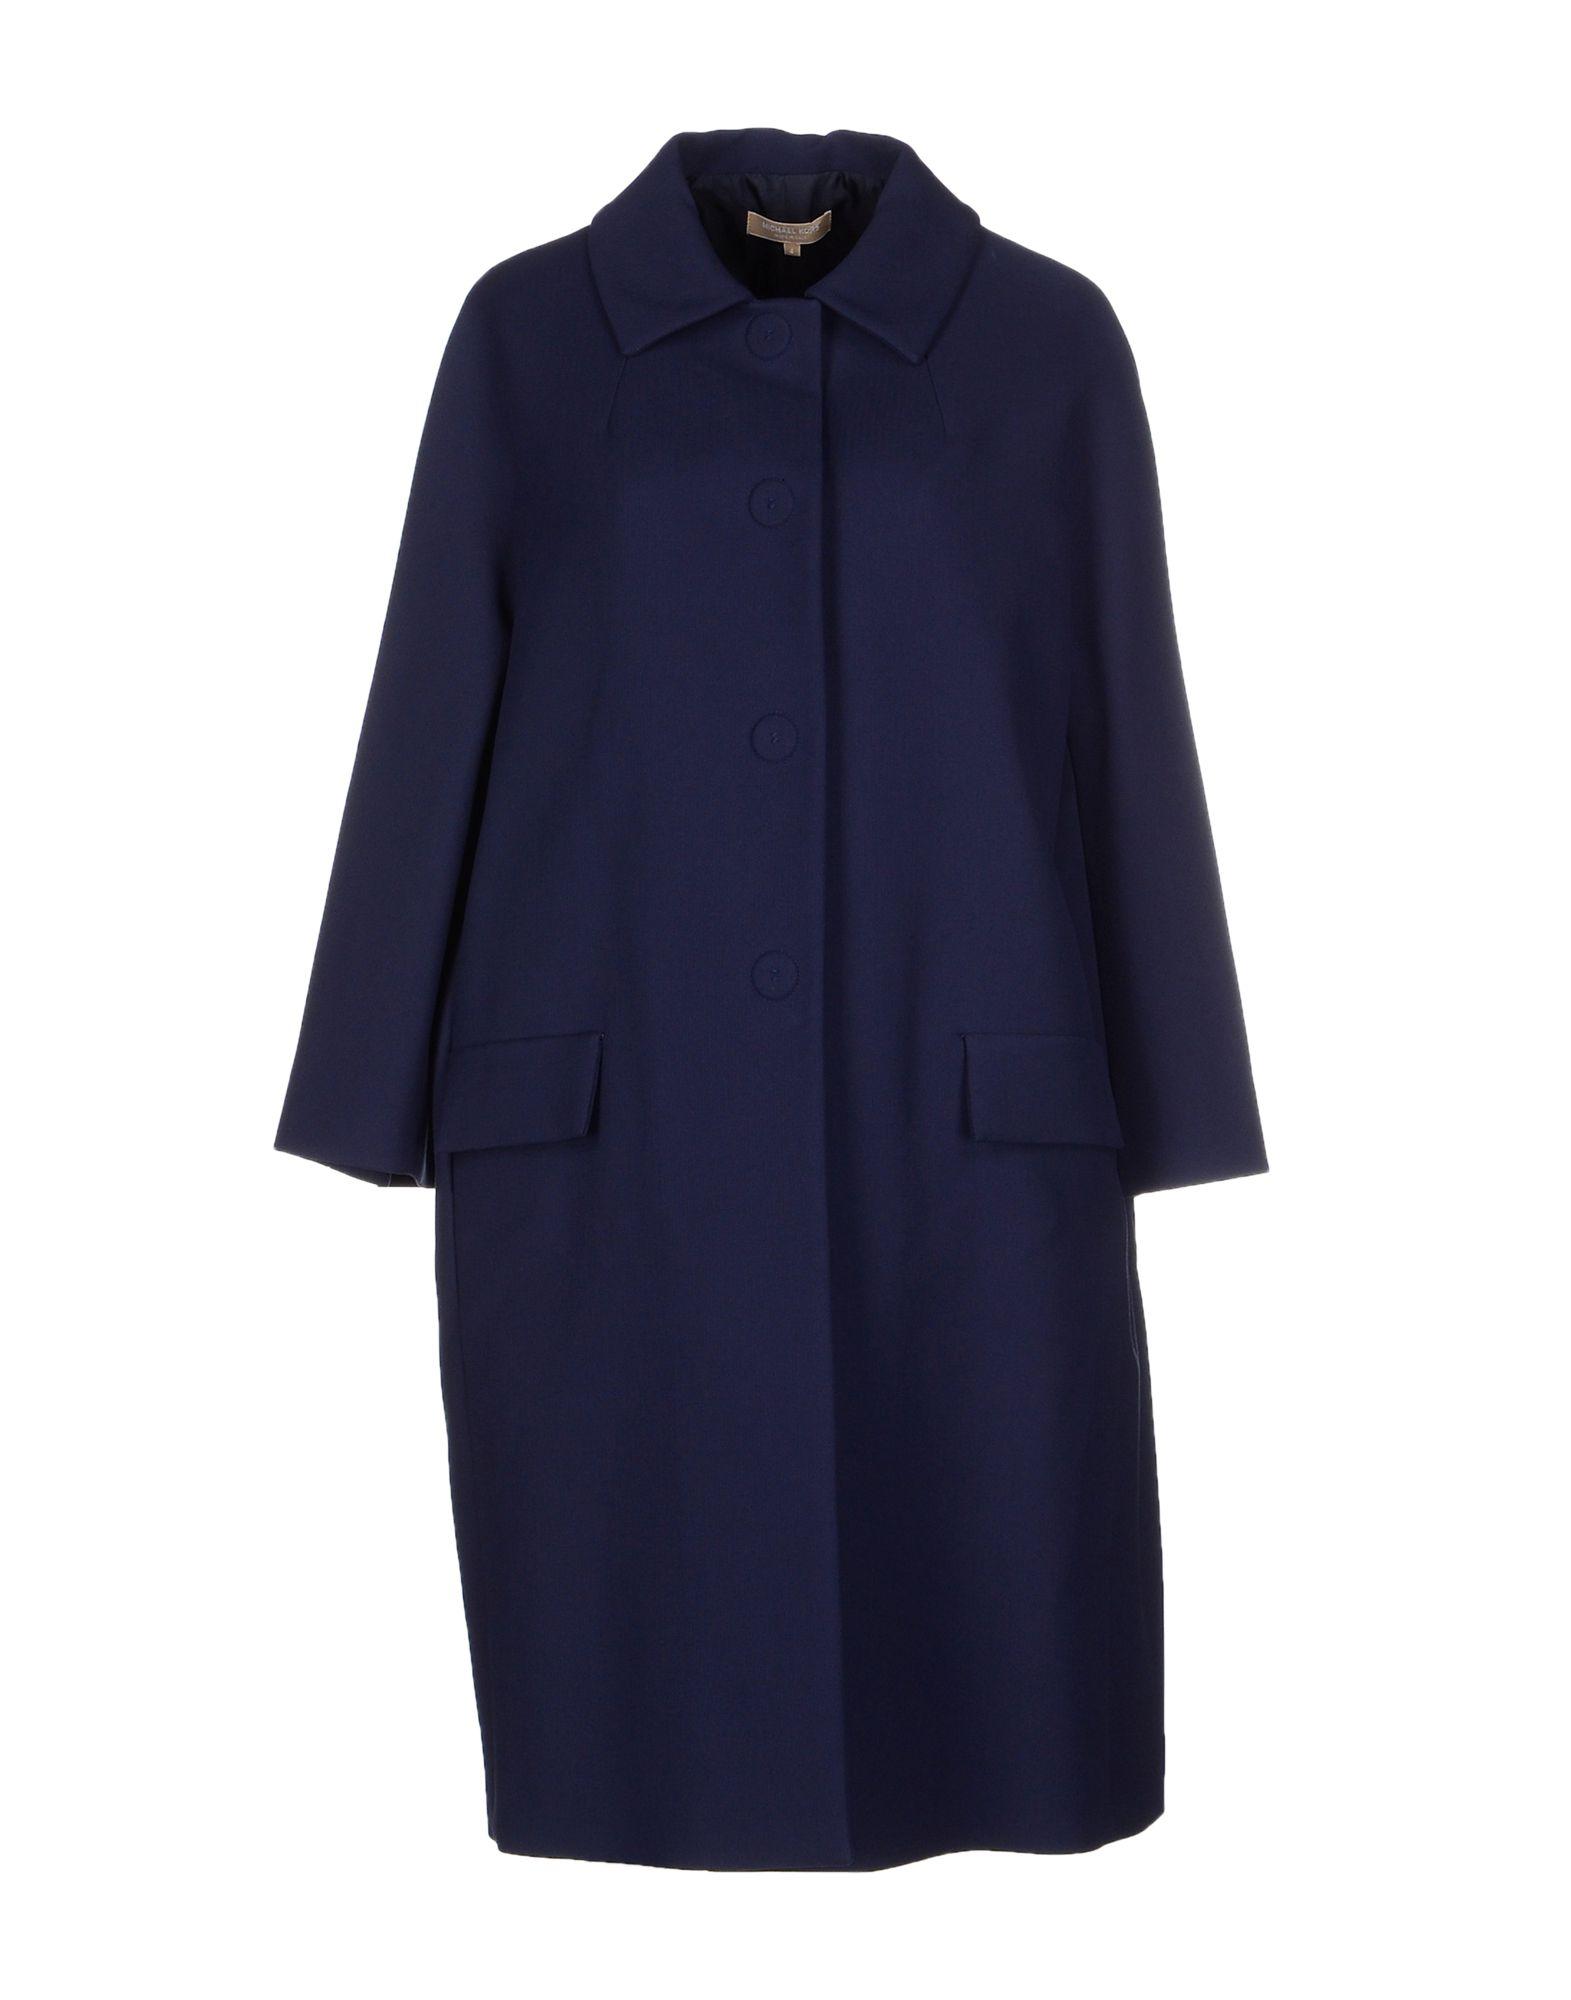 michael kors female michael kors coats